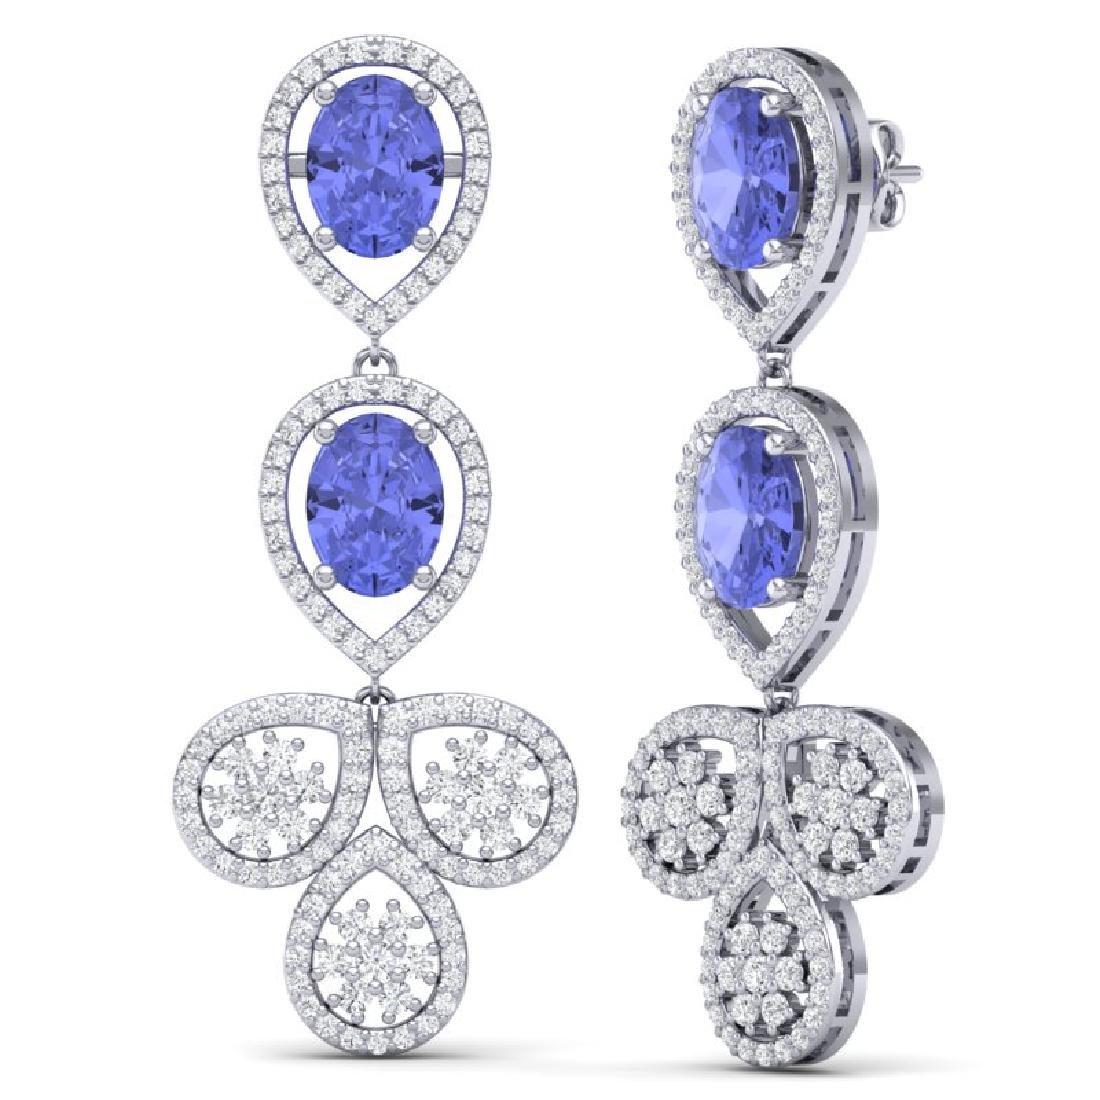 8.75 CTW Royalty Tanzanite & VS Diamond Earrings 18K - 3